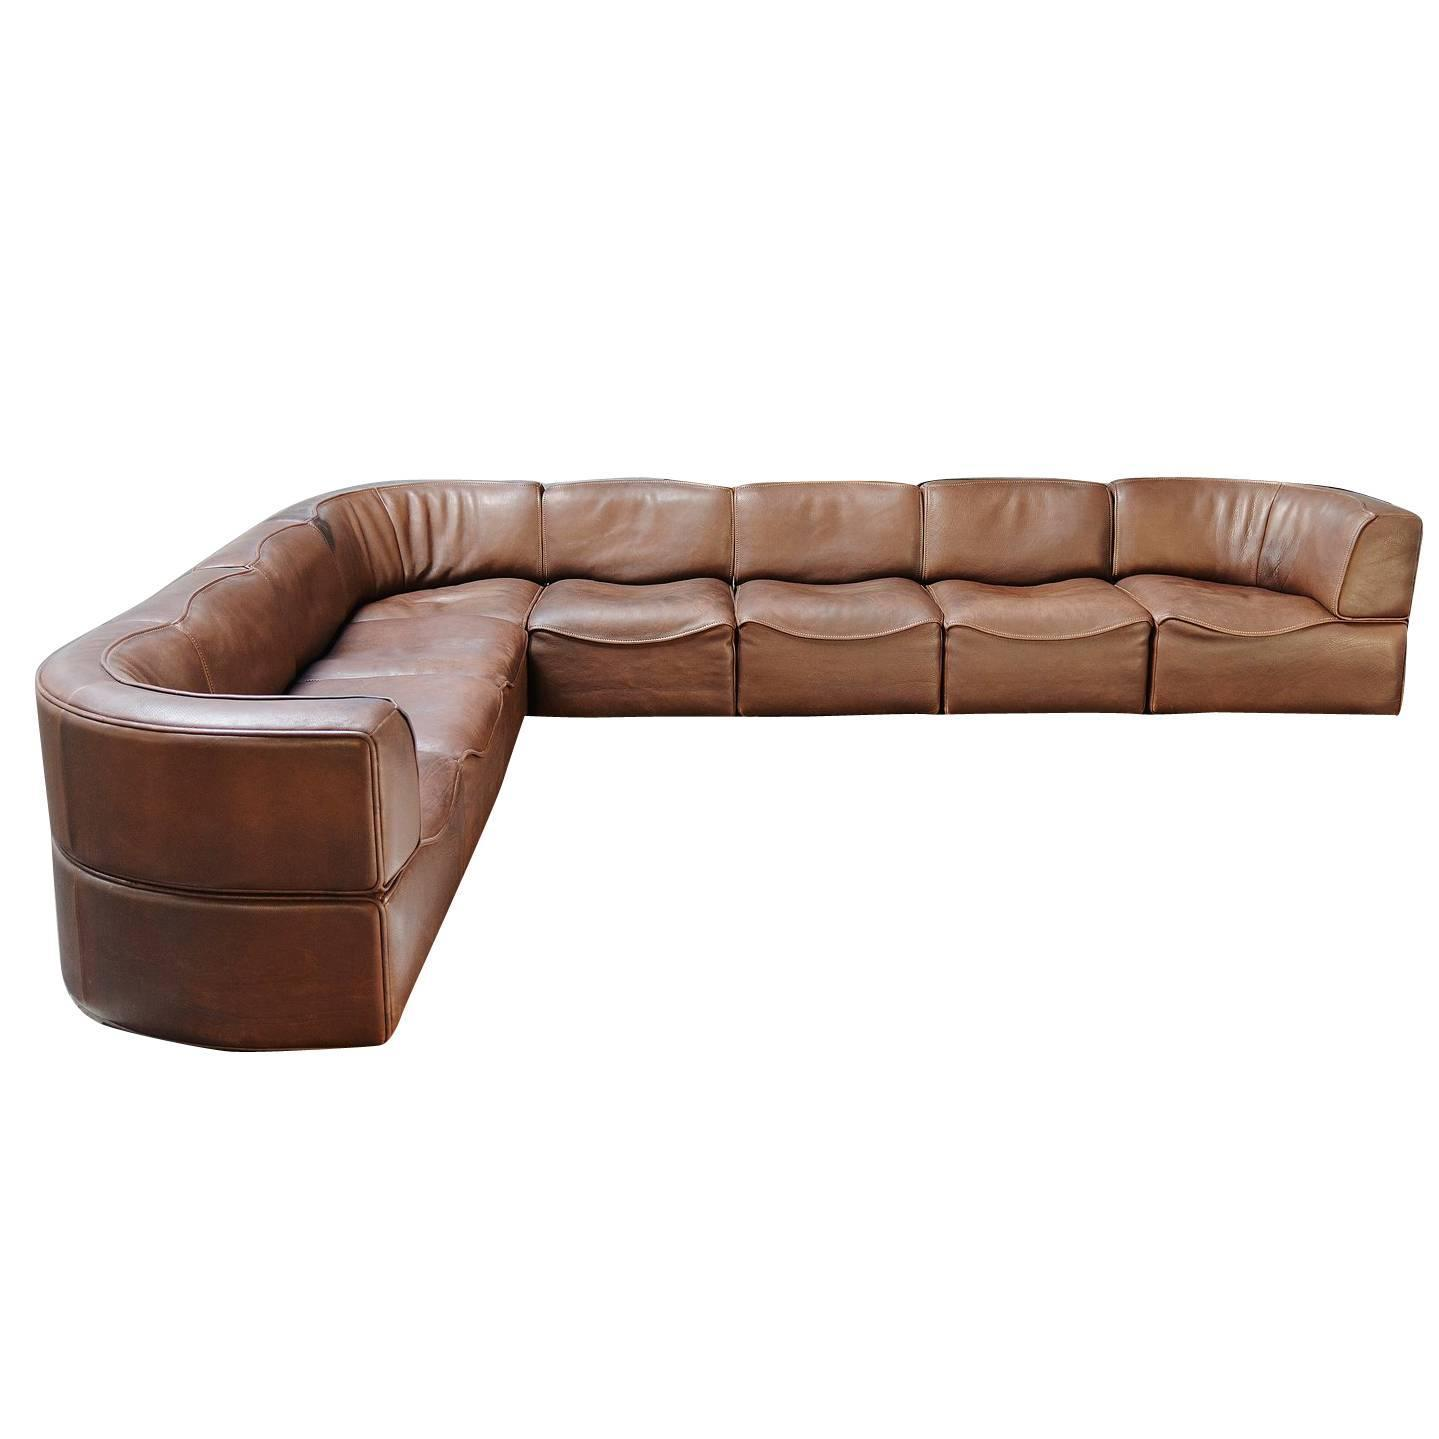 de sede ds15 element sofa in buffalo leather switzerland 1970 at 1stdibs. Black Bedroom Furniture Sets. Home Design Ideas